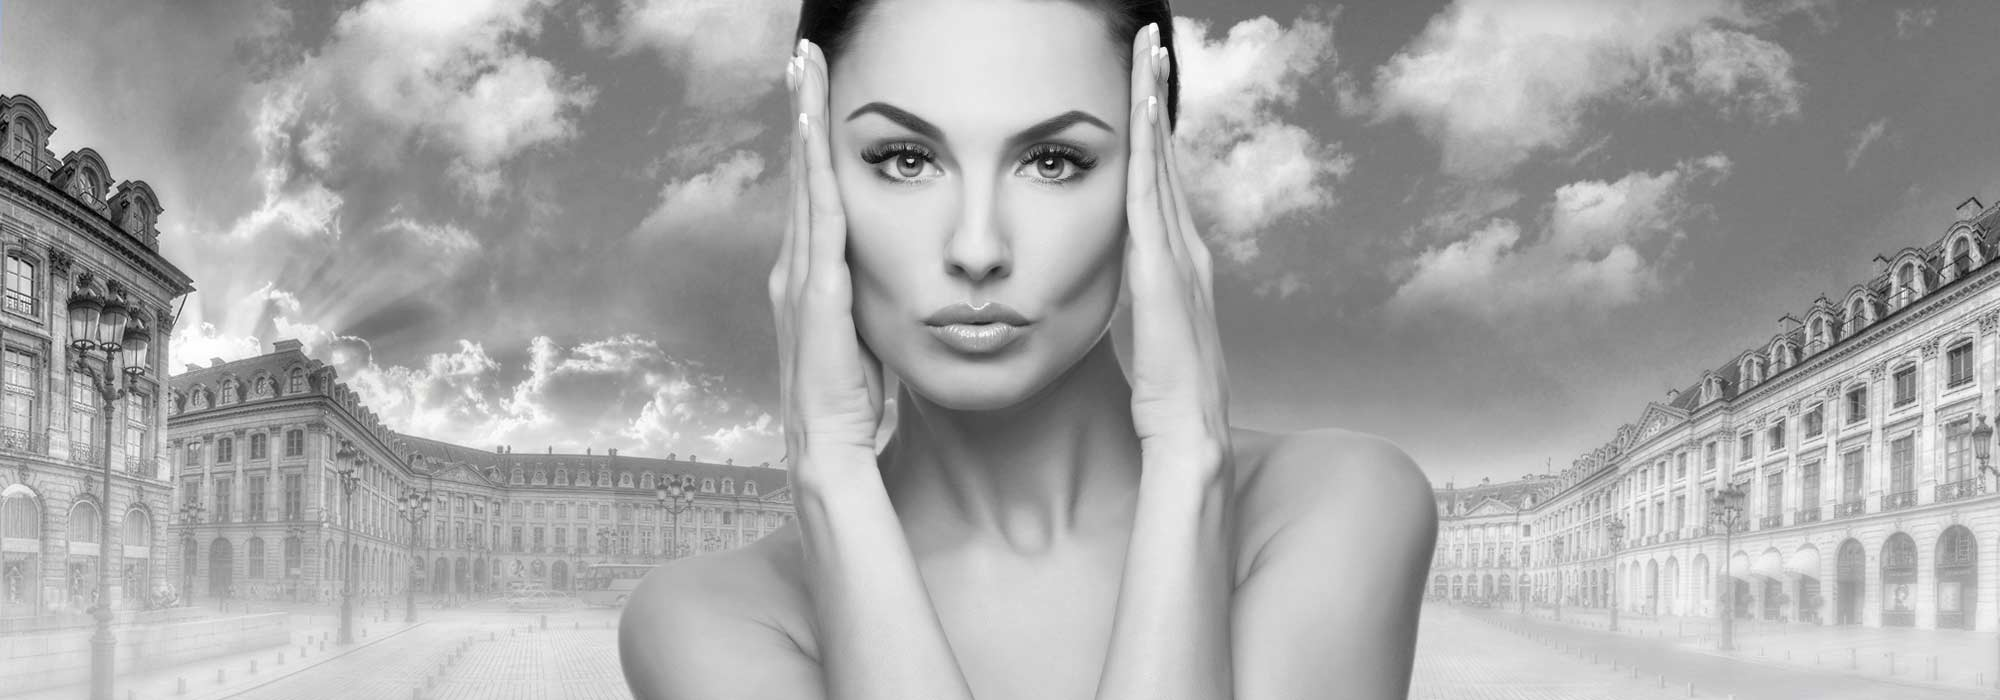 Ultherapy lifting du visage Paris Dr Cozanet